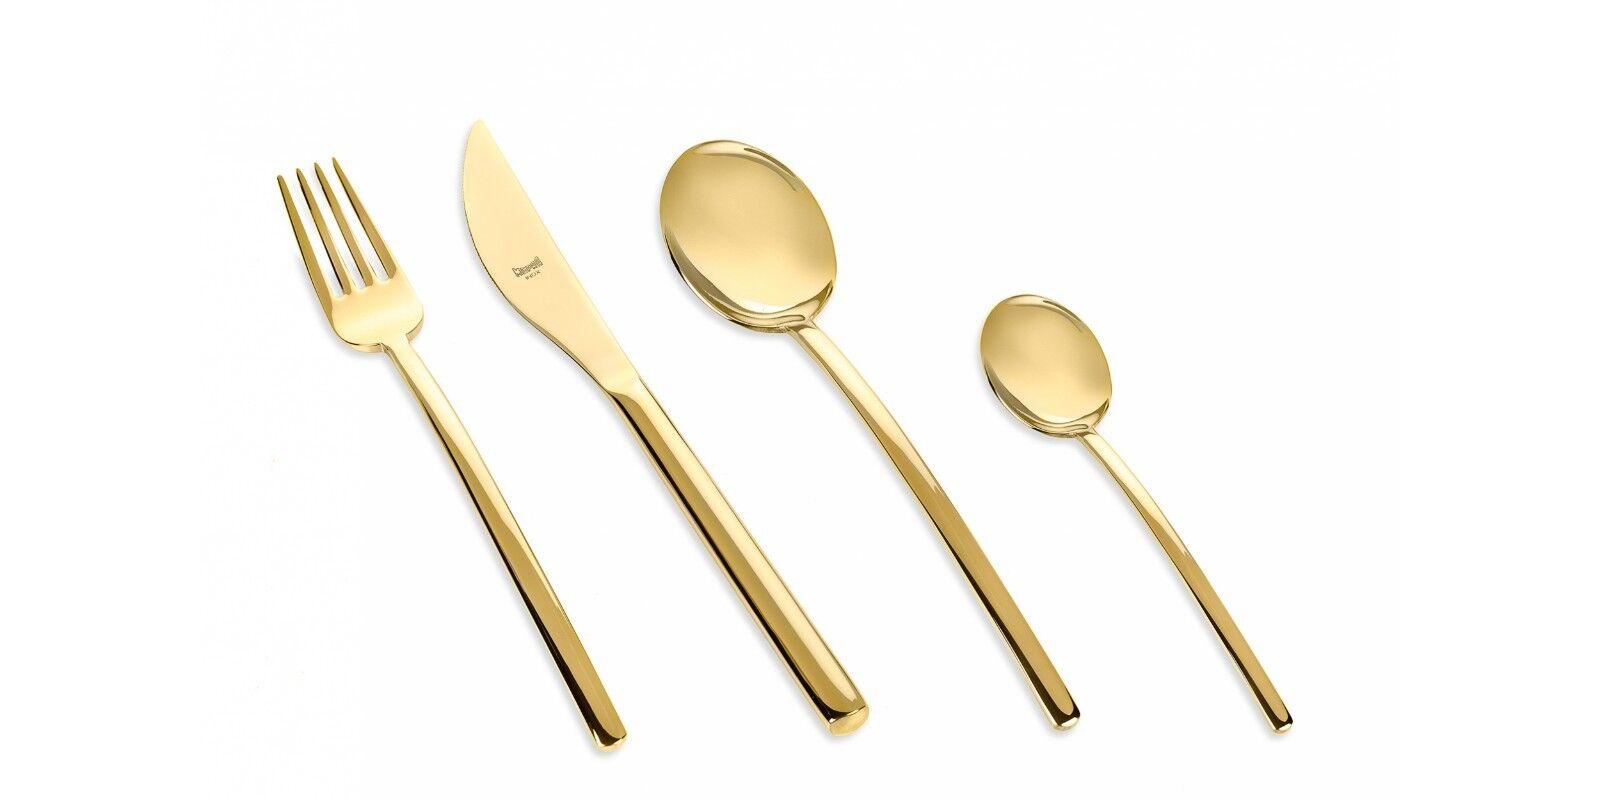 Mepra - Posto Tavola 4 Pezzi Posate Titanium Due Gold The Luxury Art Mepra